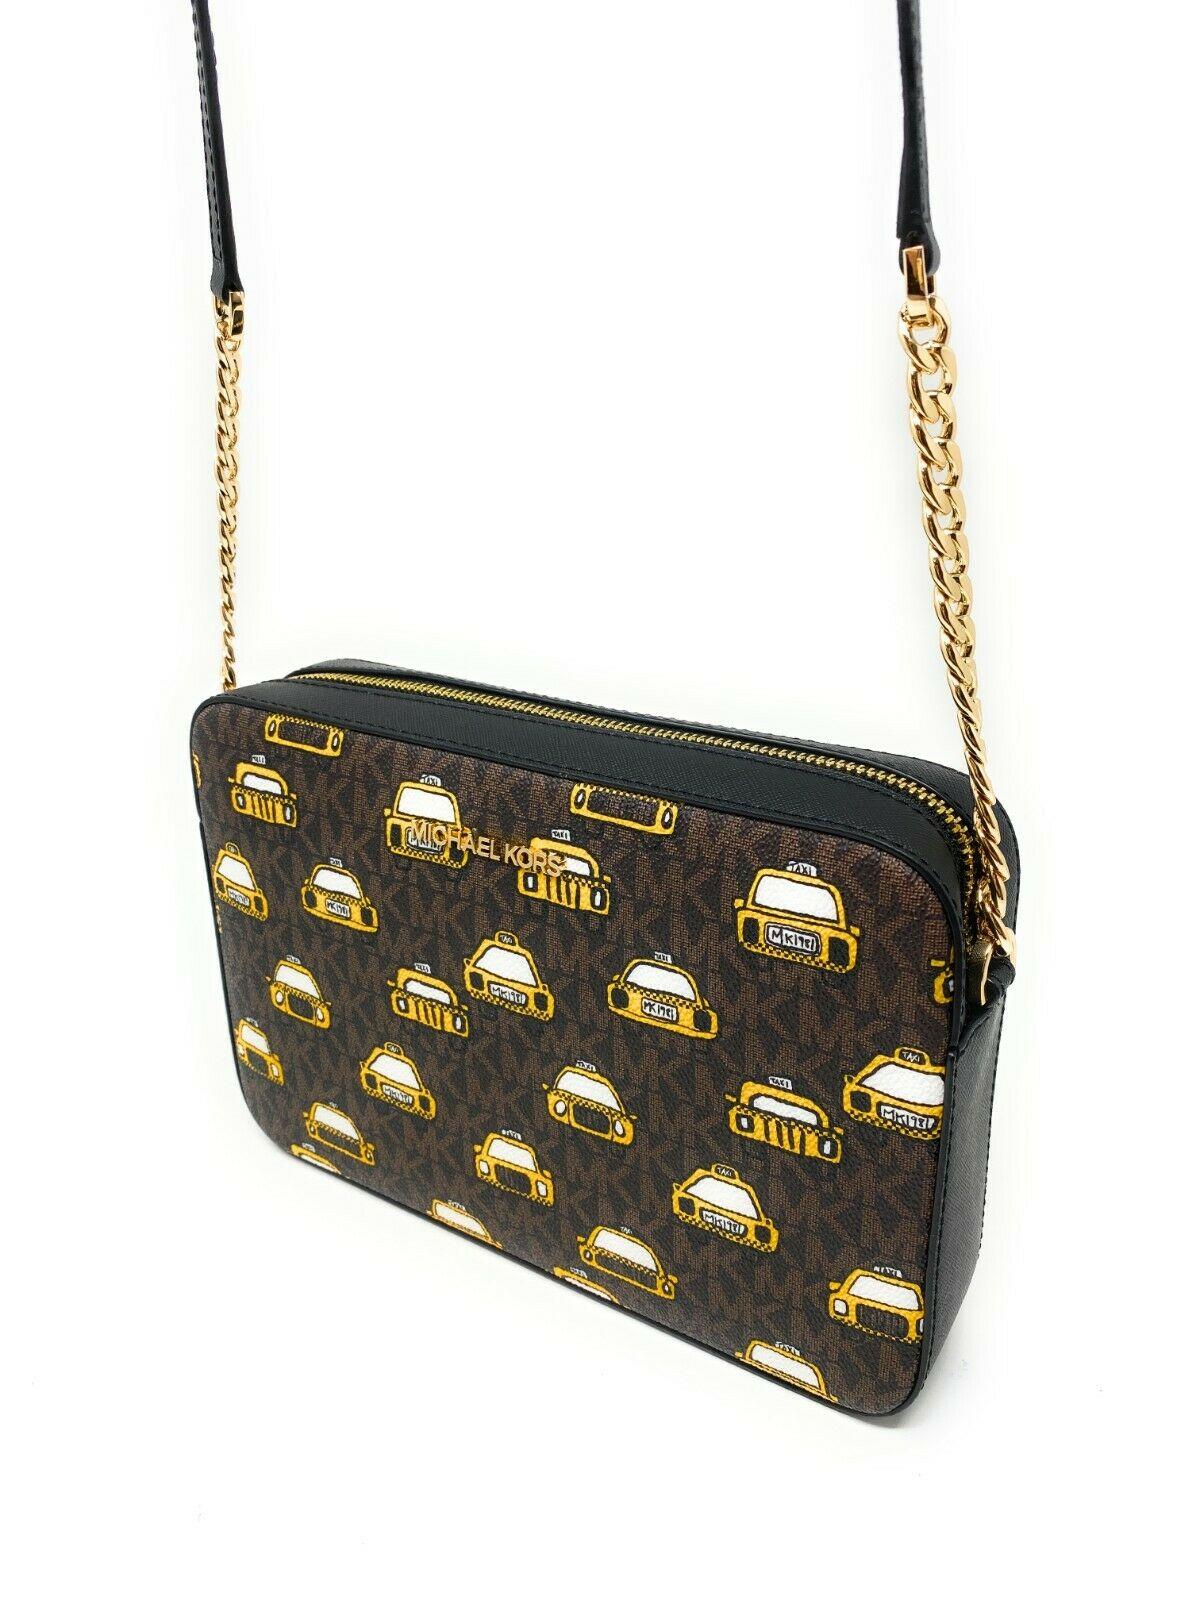 thumbnail 39 - Michael Kors Jet Set Item Large East West Crossbody Chain Handbag Clutch $298